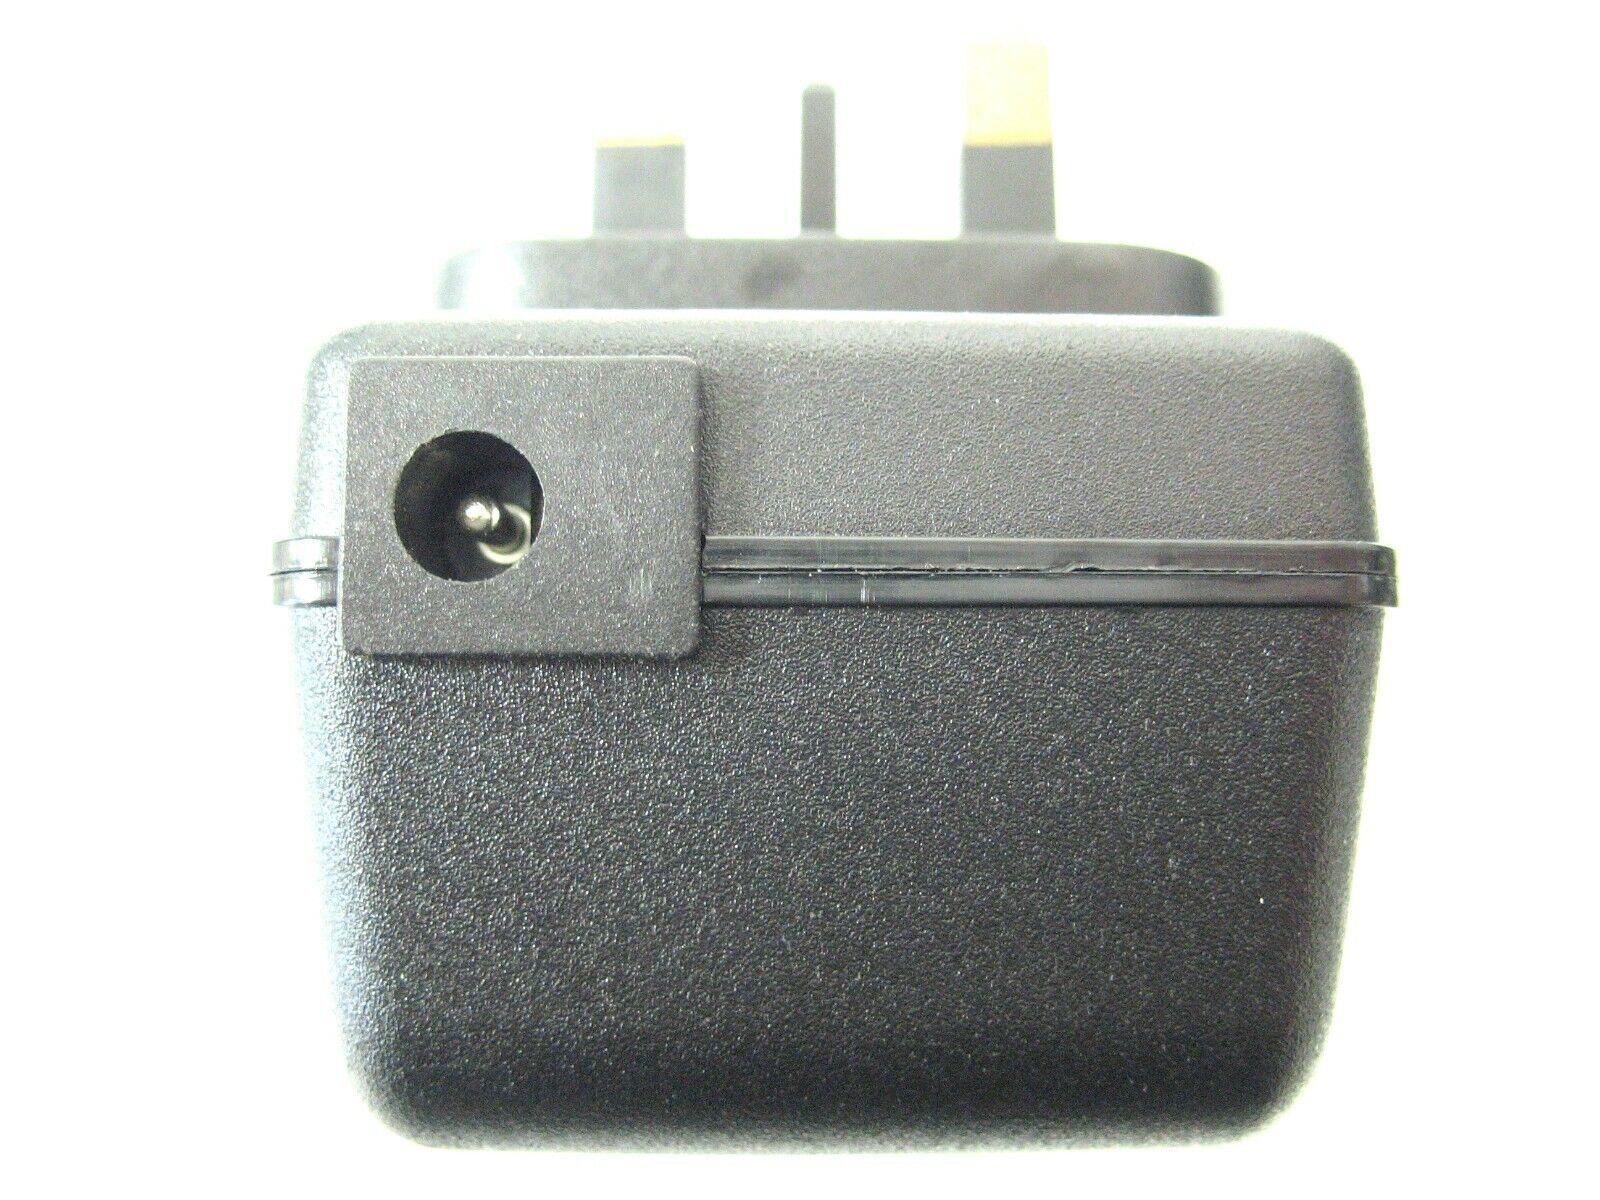 0.15 amp 24 volt Socket AC-DC (DC Output) Power Adaptor/Supply/Charger 3.6 watt